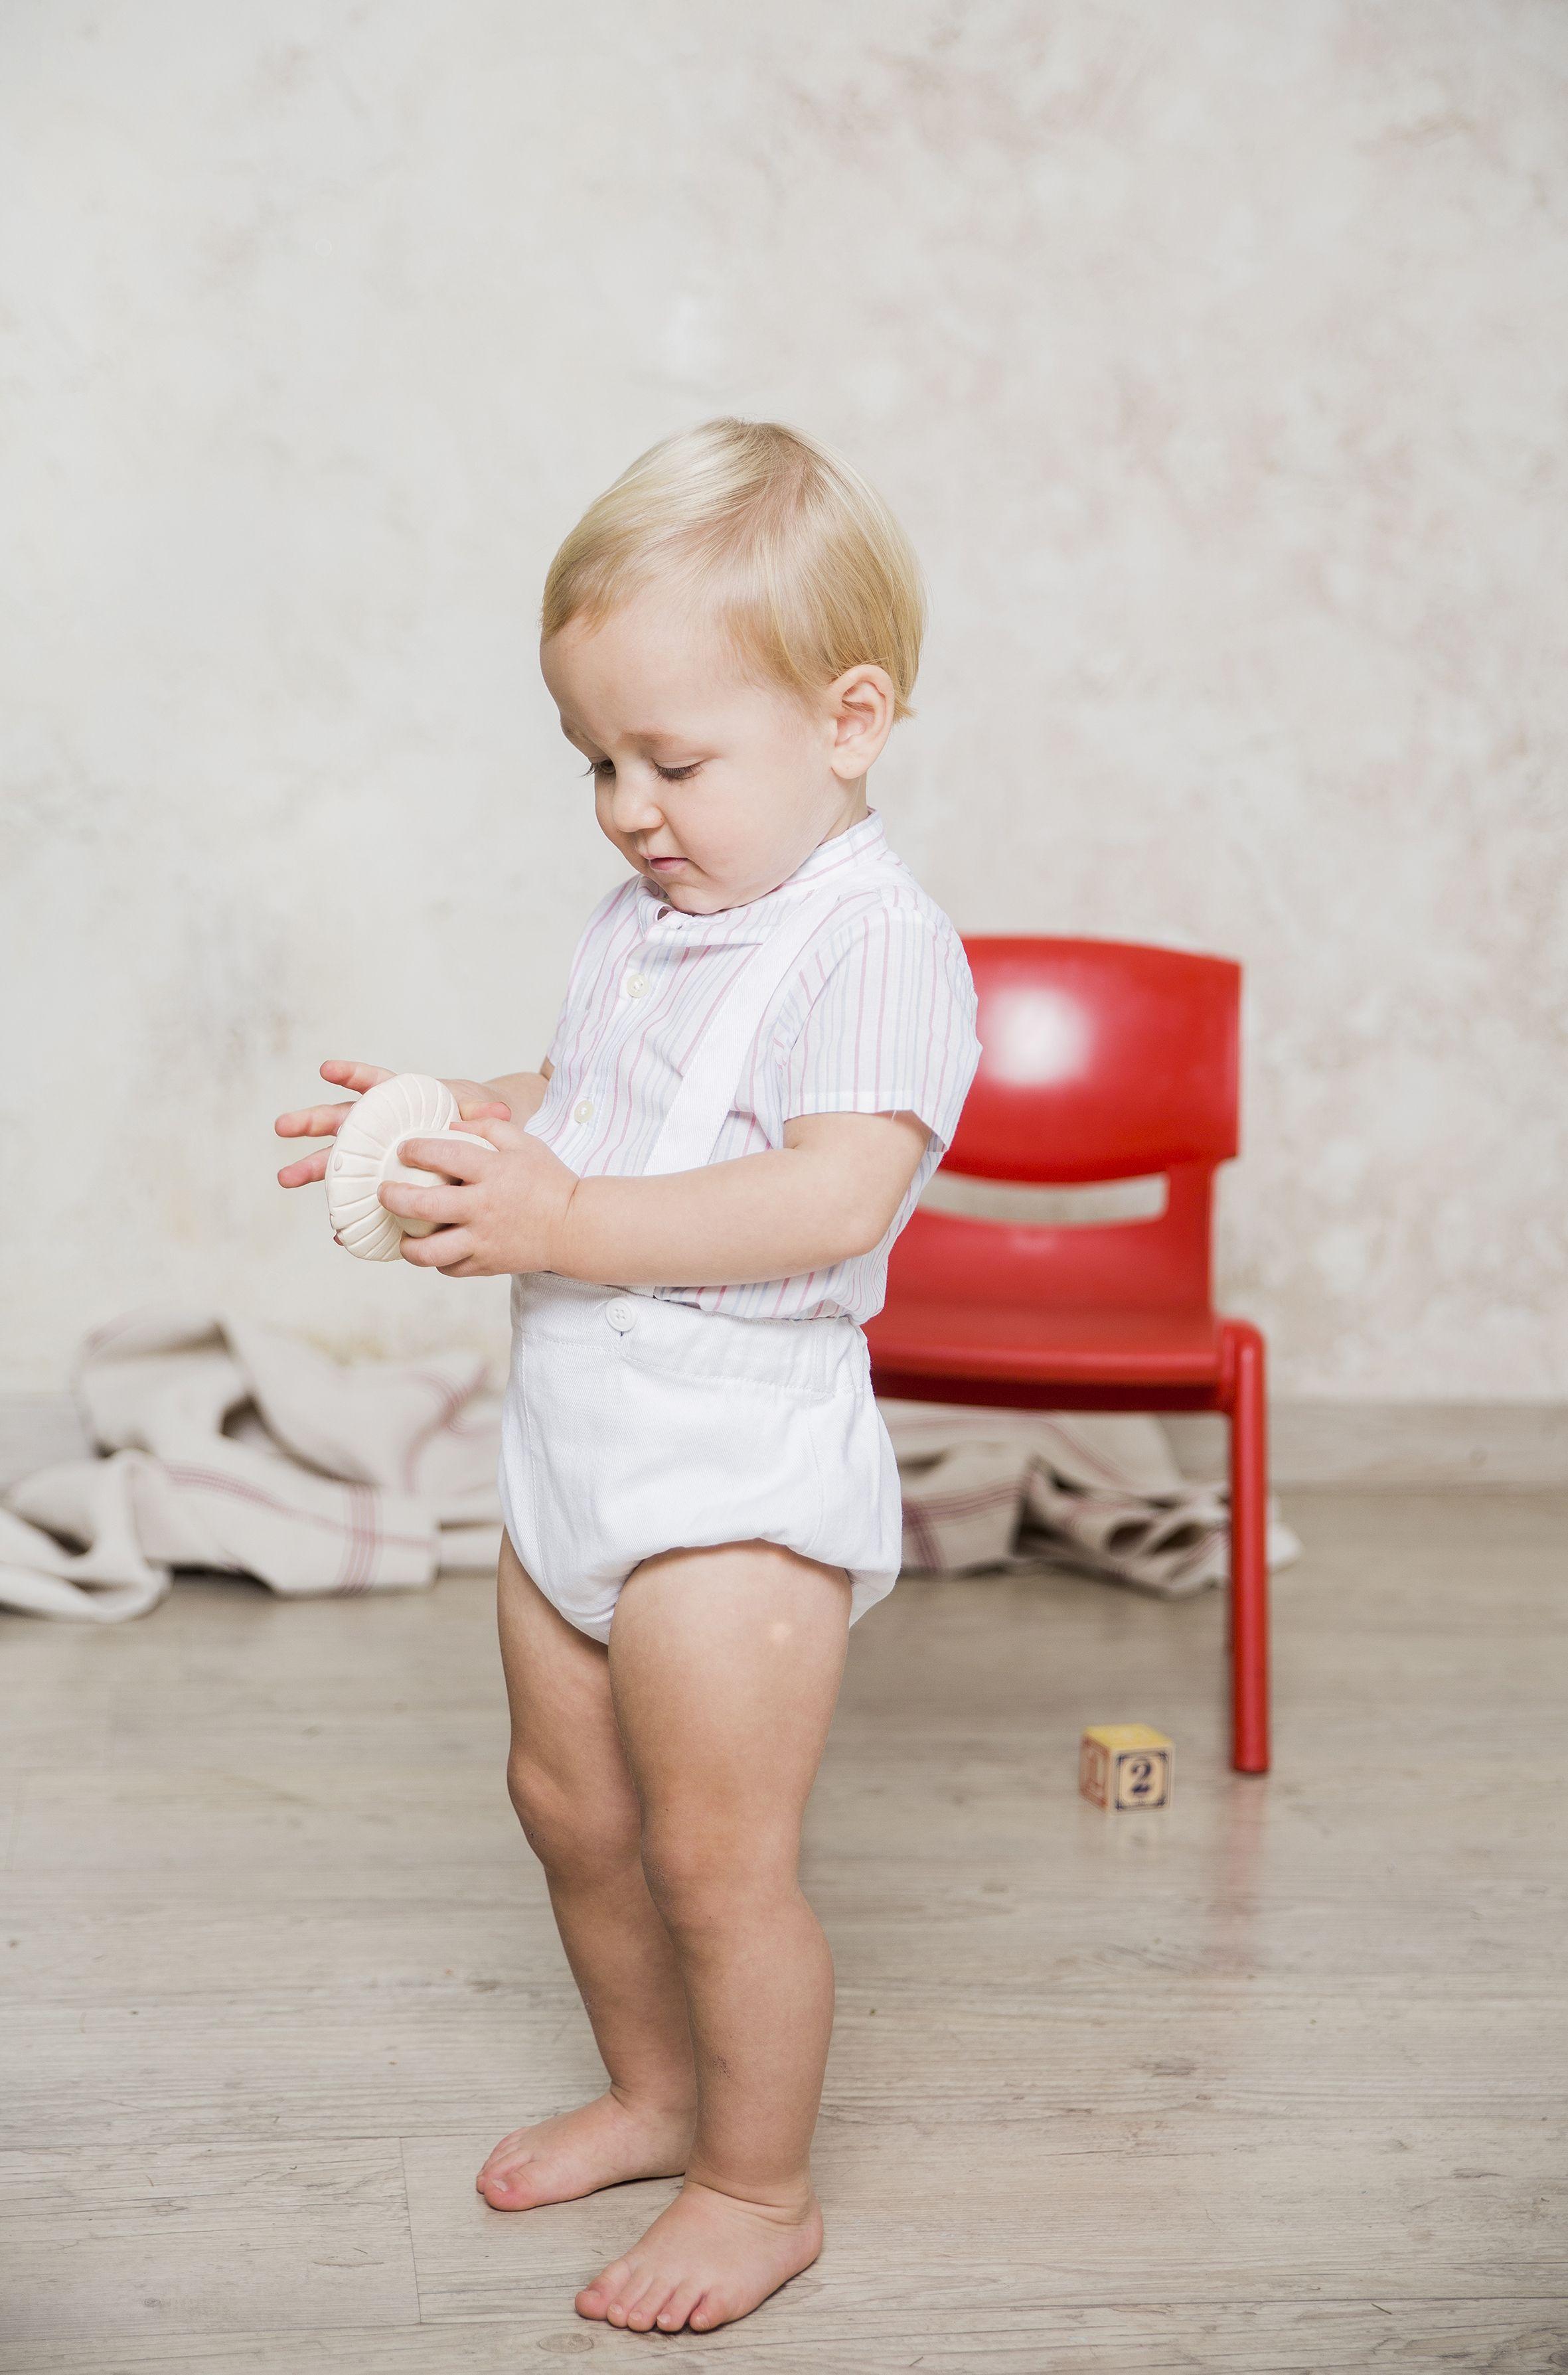 gocco  goccokids  moda  fashion  bebes  babies  niños  kids  teen   teenagers  cool  lomas  lovely  cute  charming  adorable  irresistible  www.gocco.com 7b3e749926b